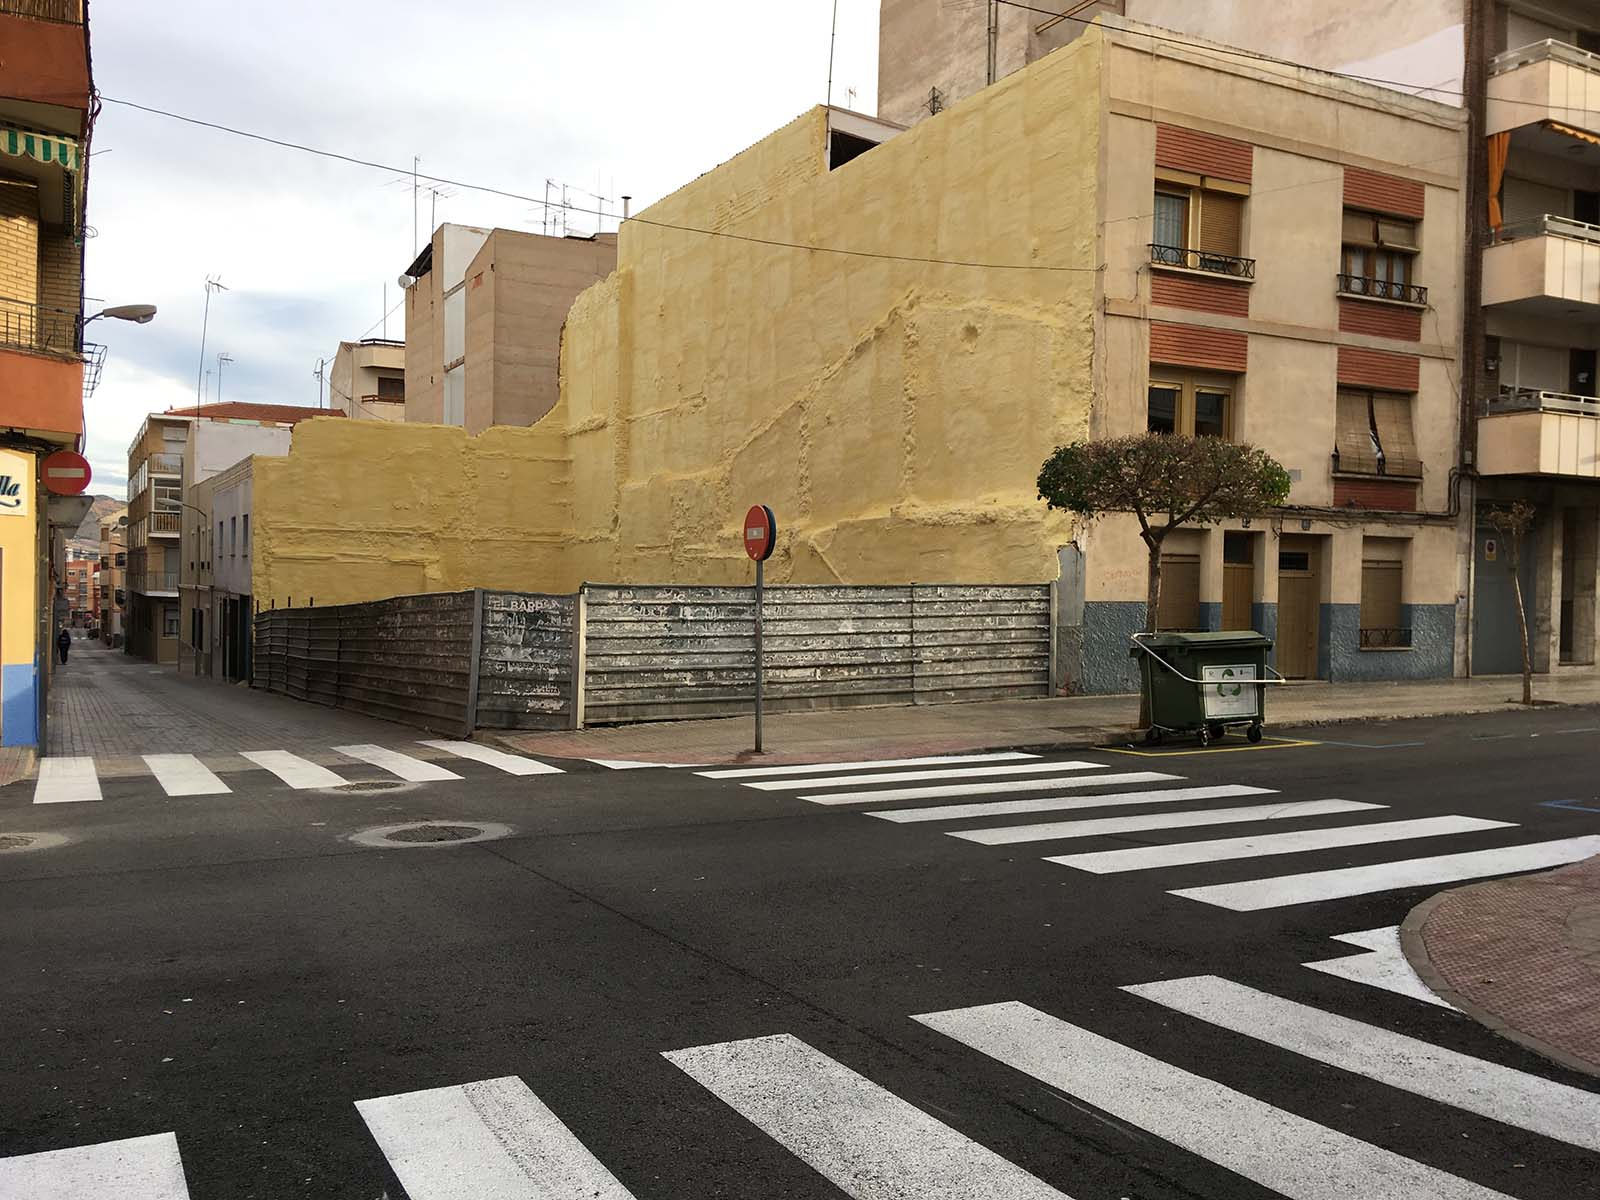 Pasos de cebra. Calle San José. Yecla, enero 2018